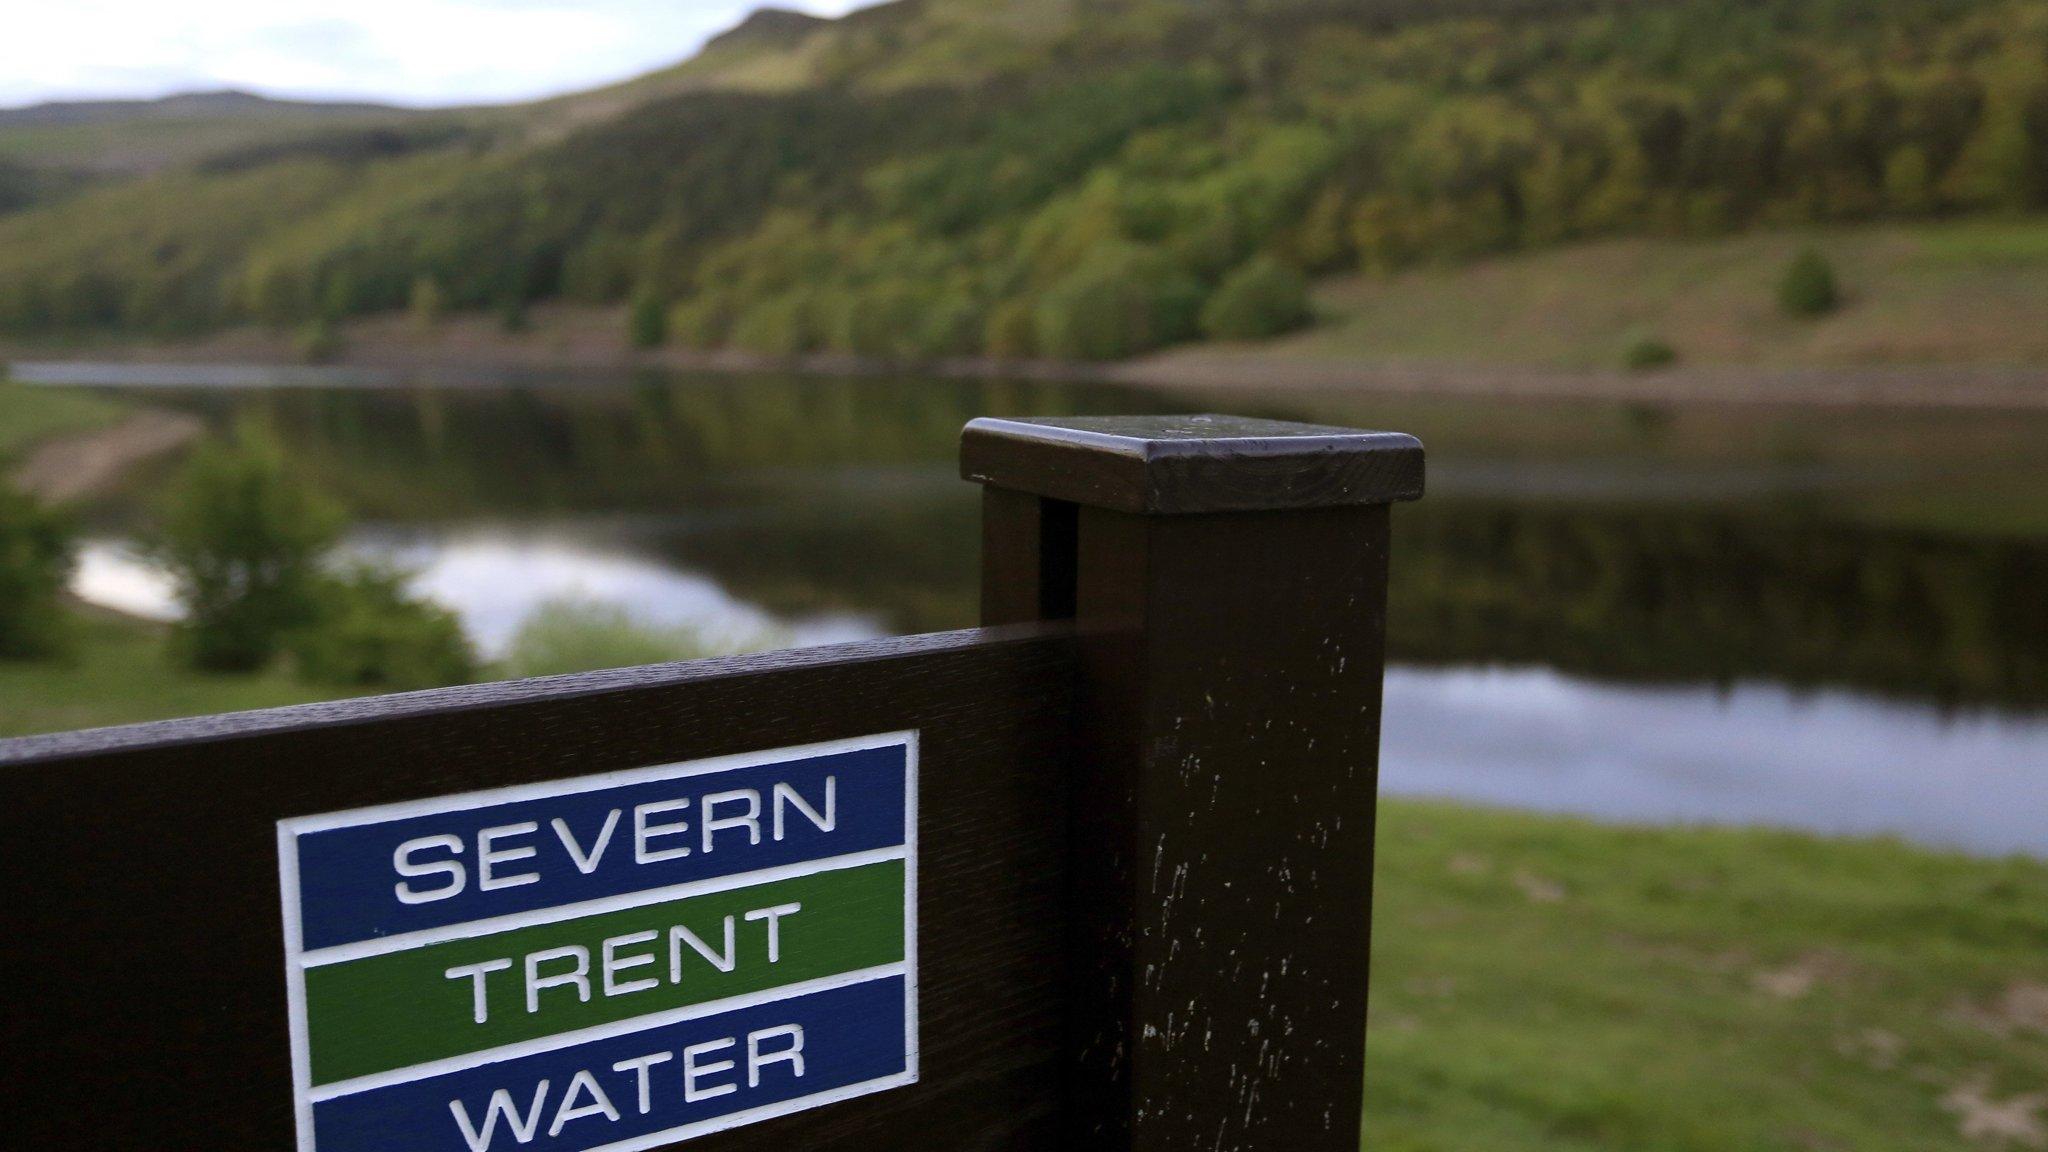 Qatari sovereign wealth fund takes £200m stake in Severn